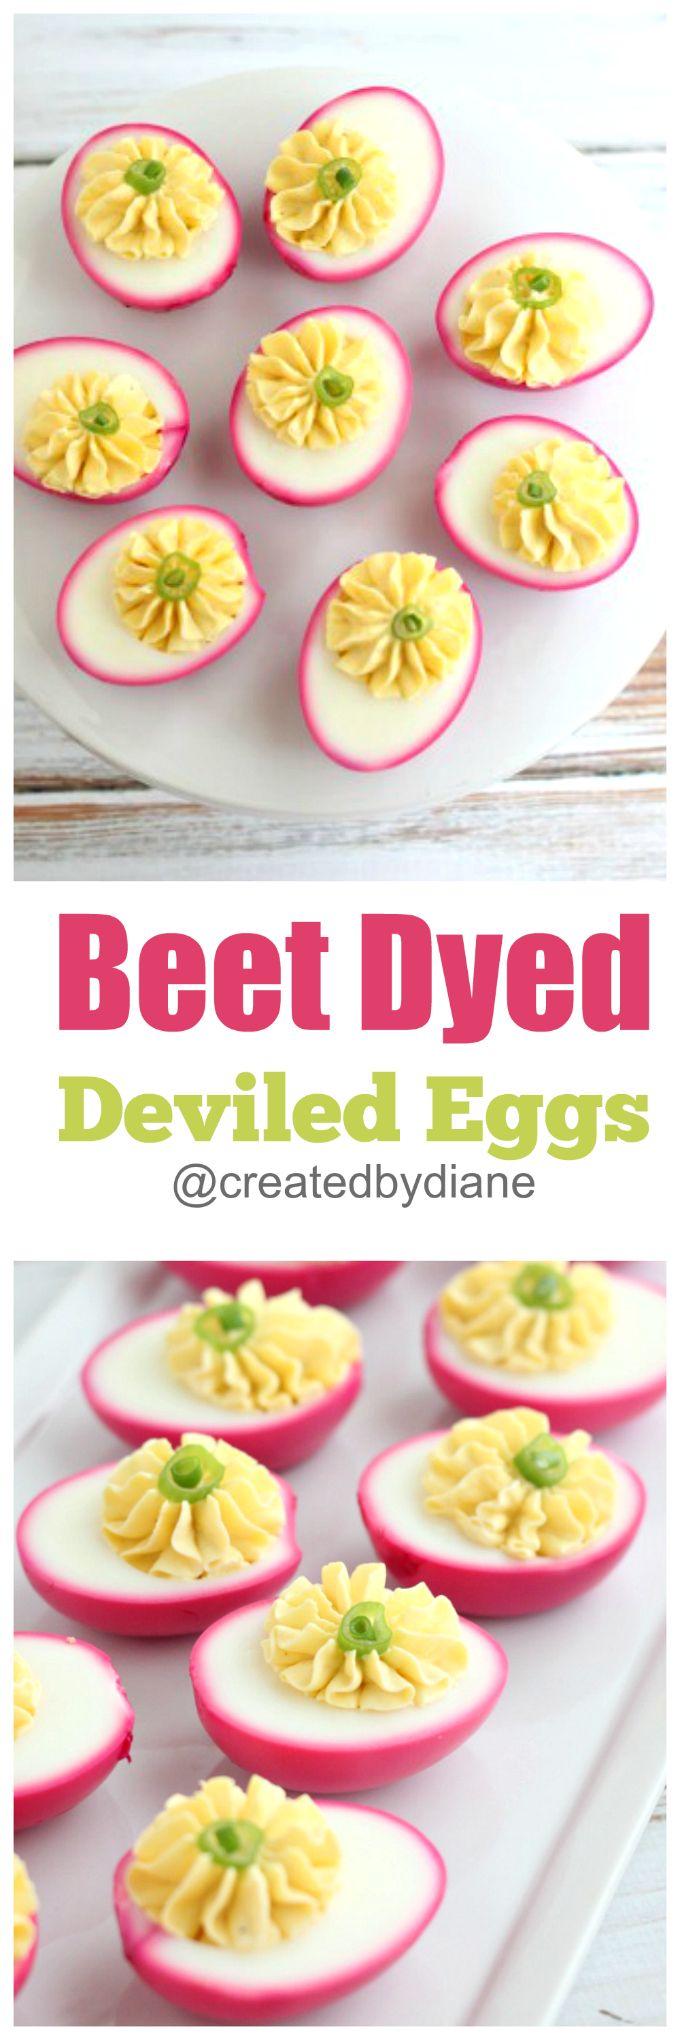 Beet Dyed Deviled Eggs @createdbydiane